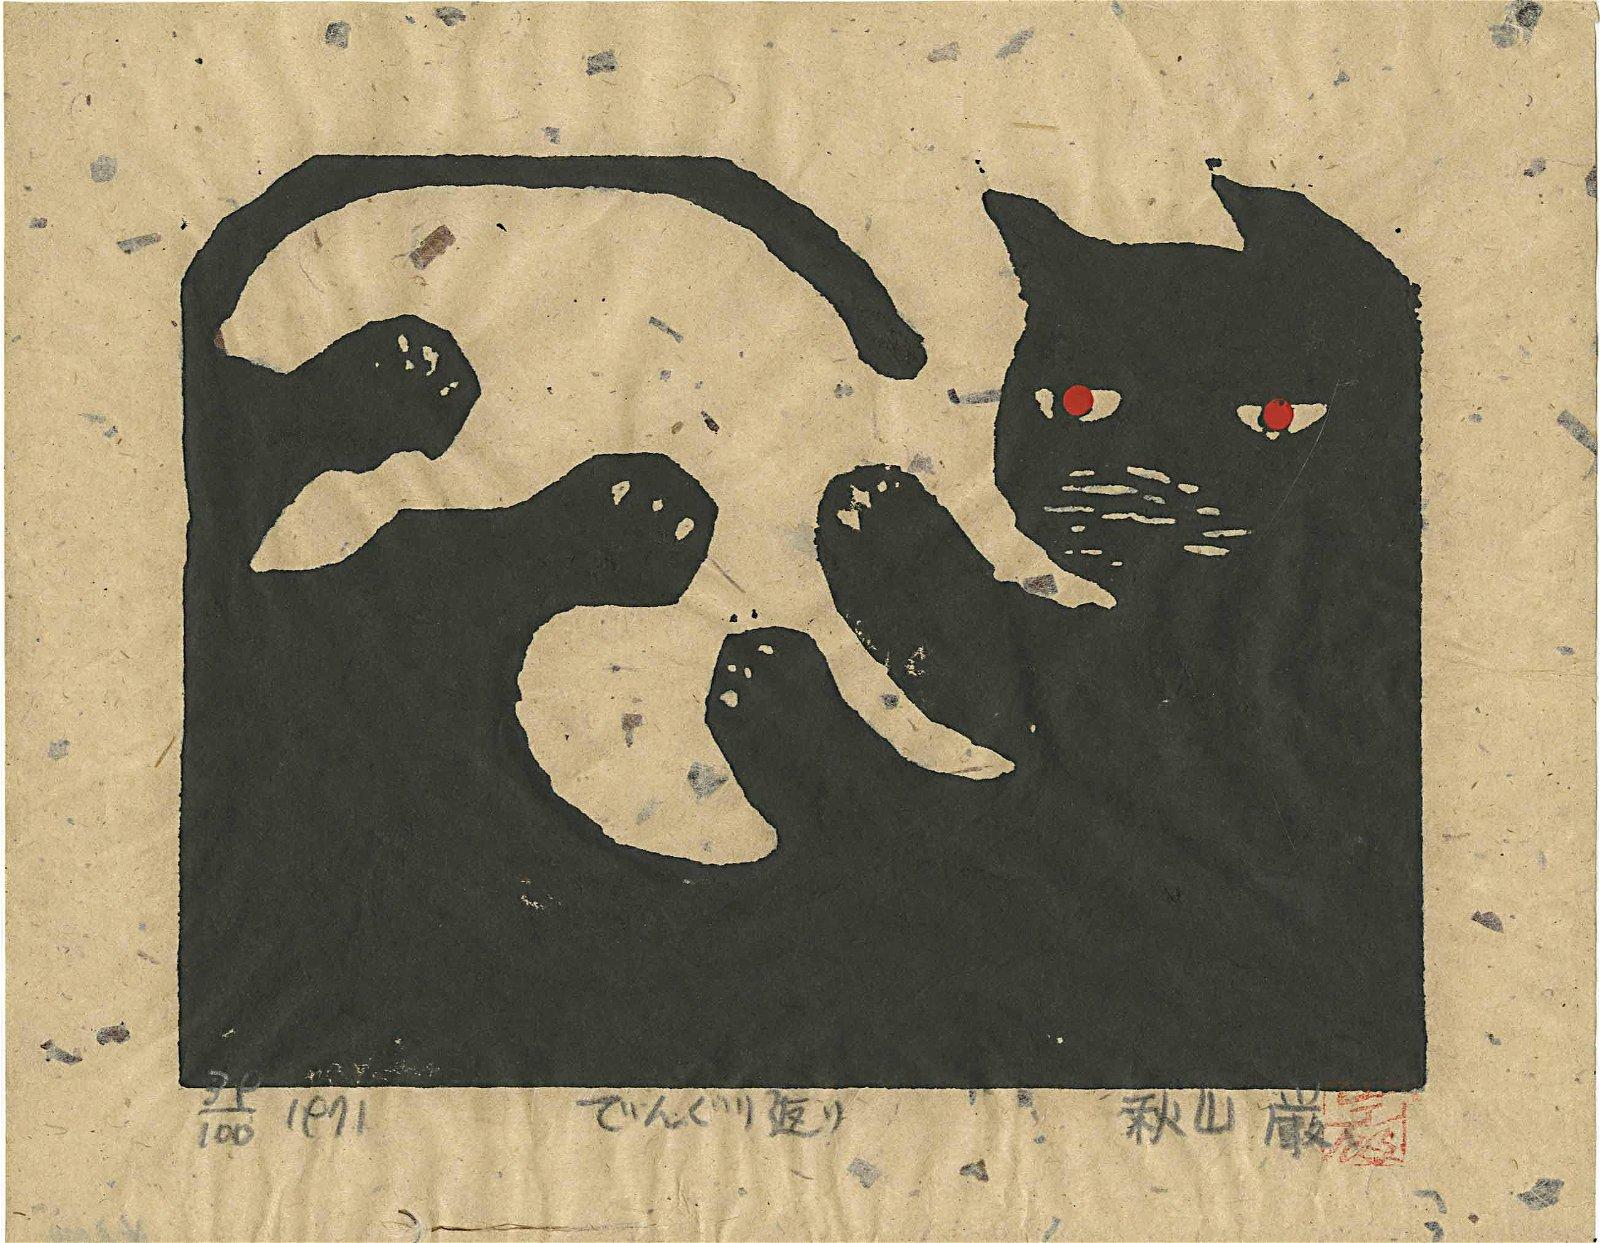 Iwao Akiyama: Cat Chasing Tail 1971 1st Ed Woodblock